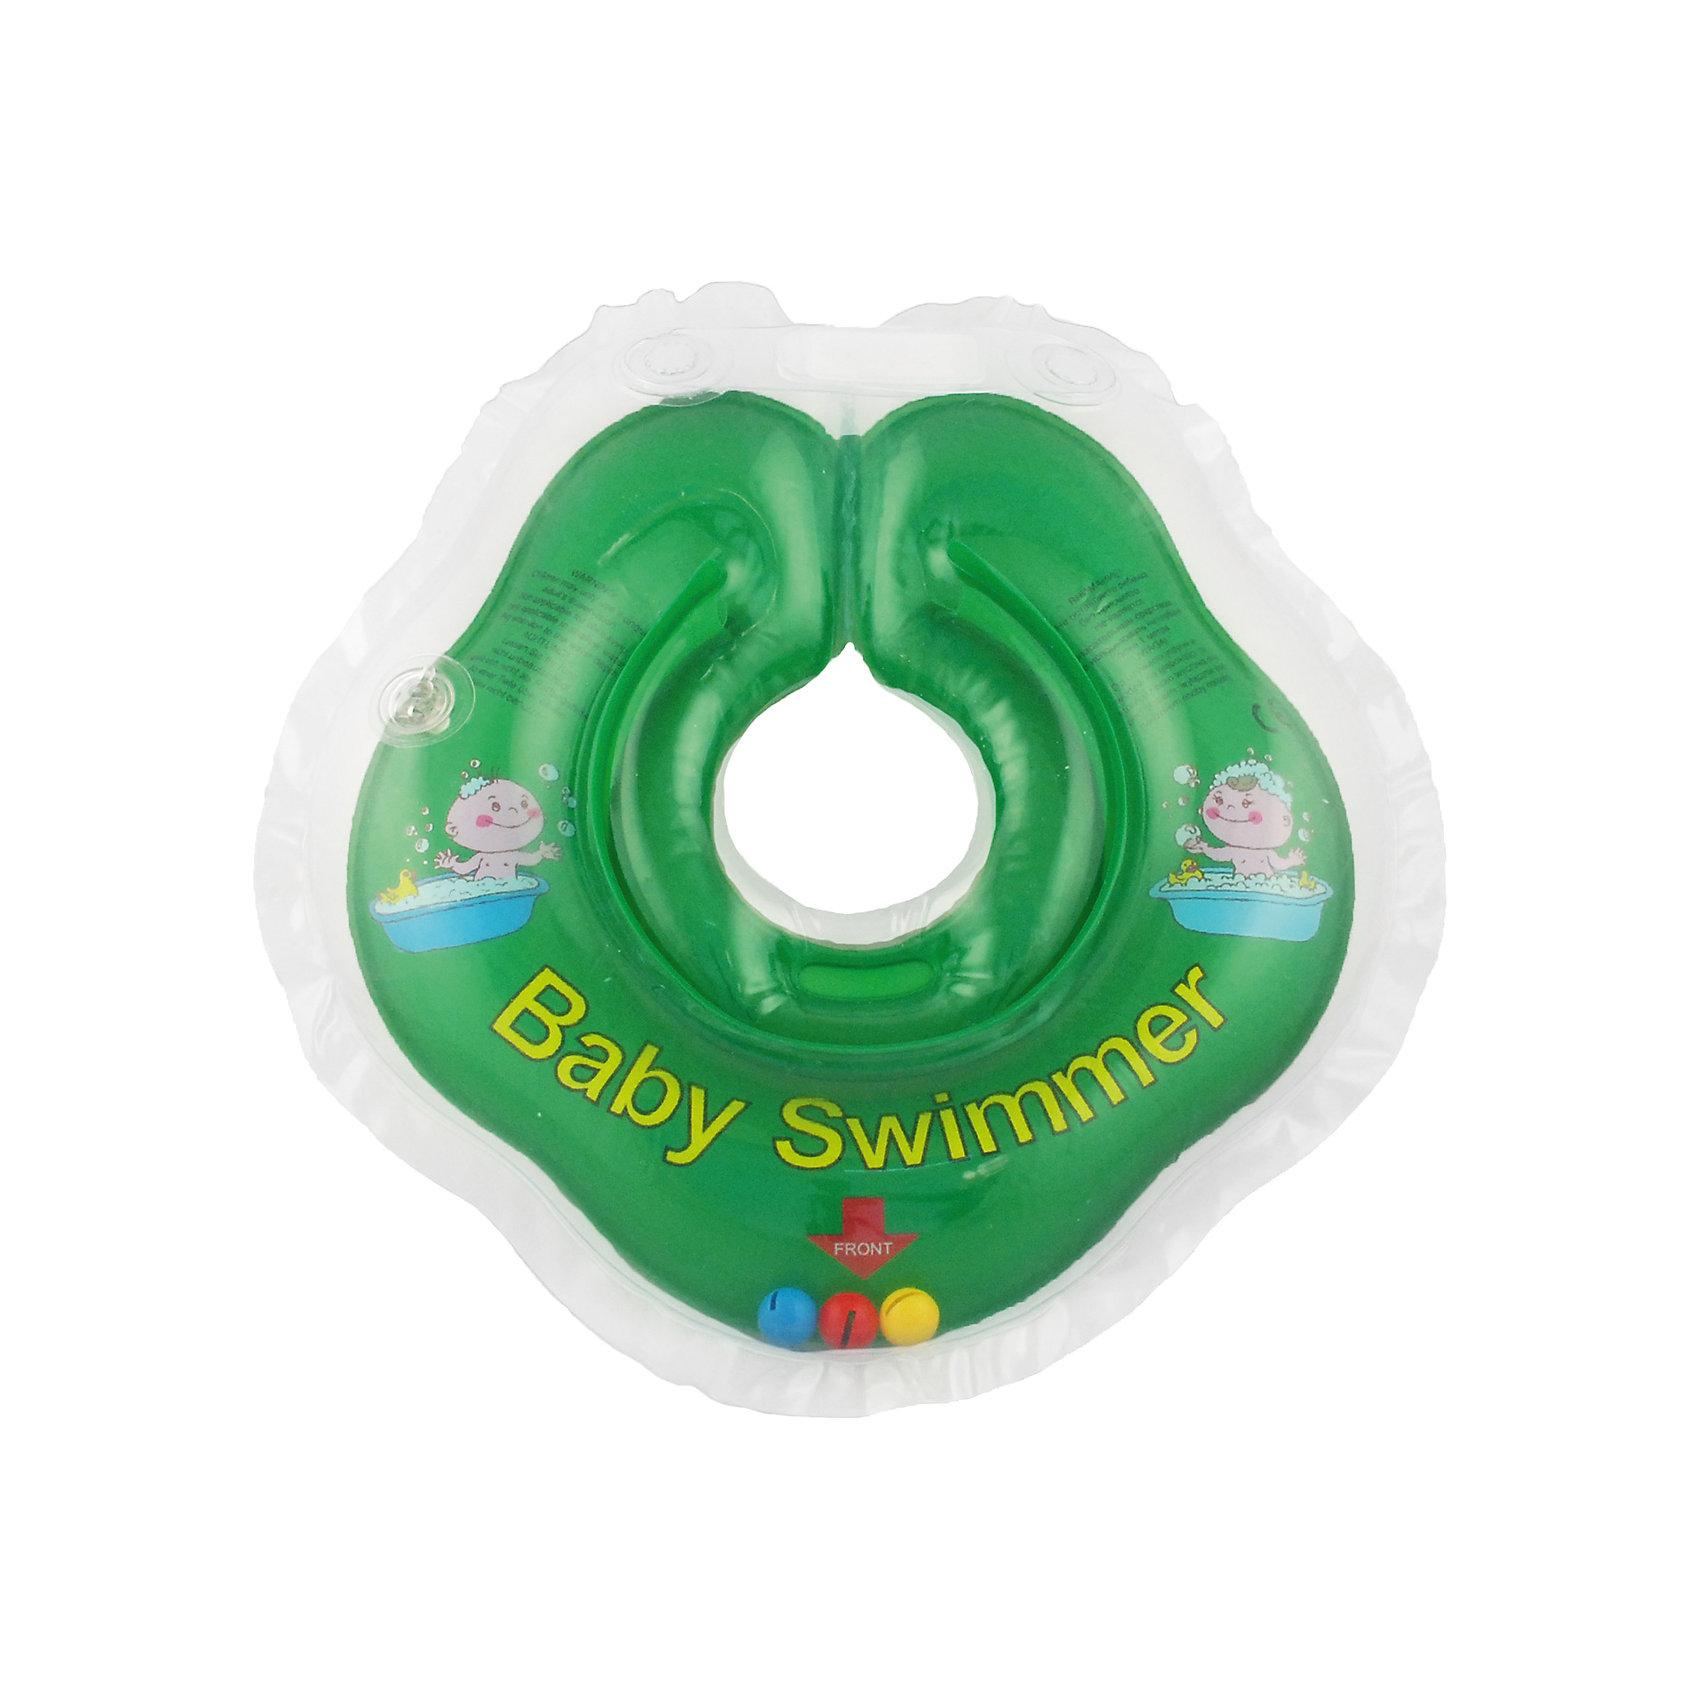 Круг для купания с погремушкой внутри BabySwimmer, зеленый (Baby Swimmer)